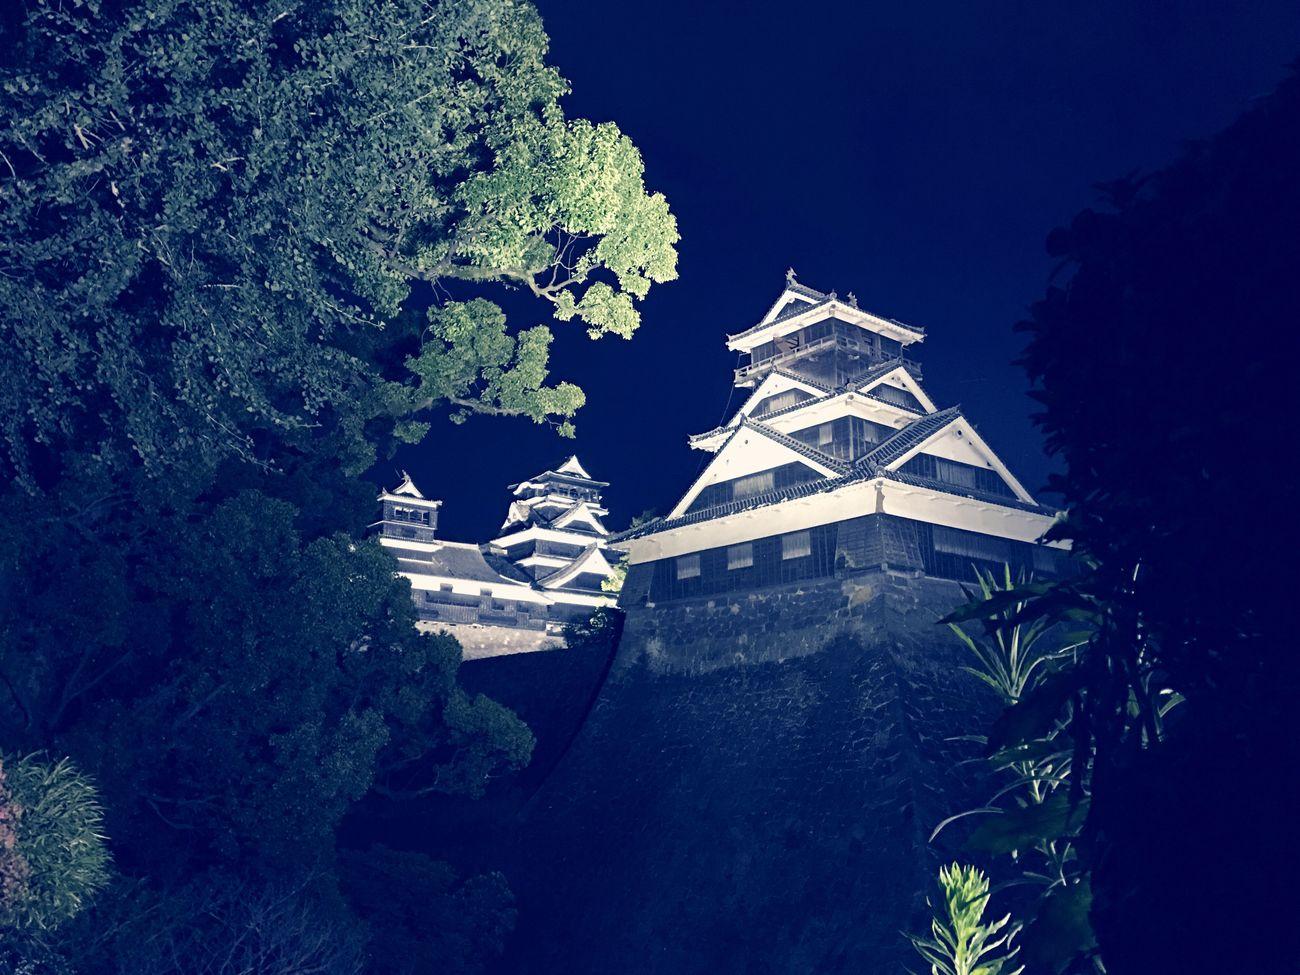 Hello World 熊本城 Kumamotocastle Kumamoto Castle Kumamoto Earthquake Kumamoto-shi Kumamoto